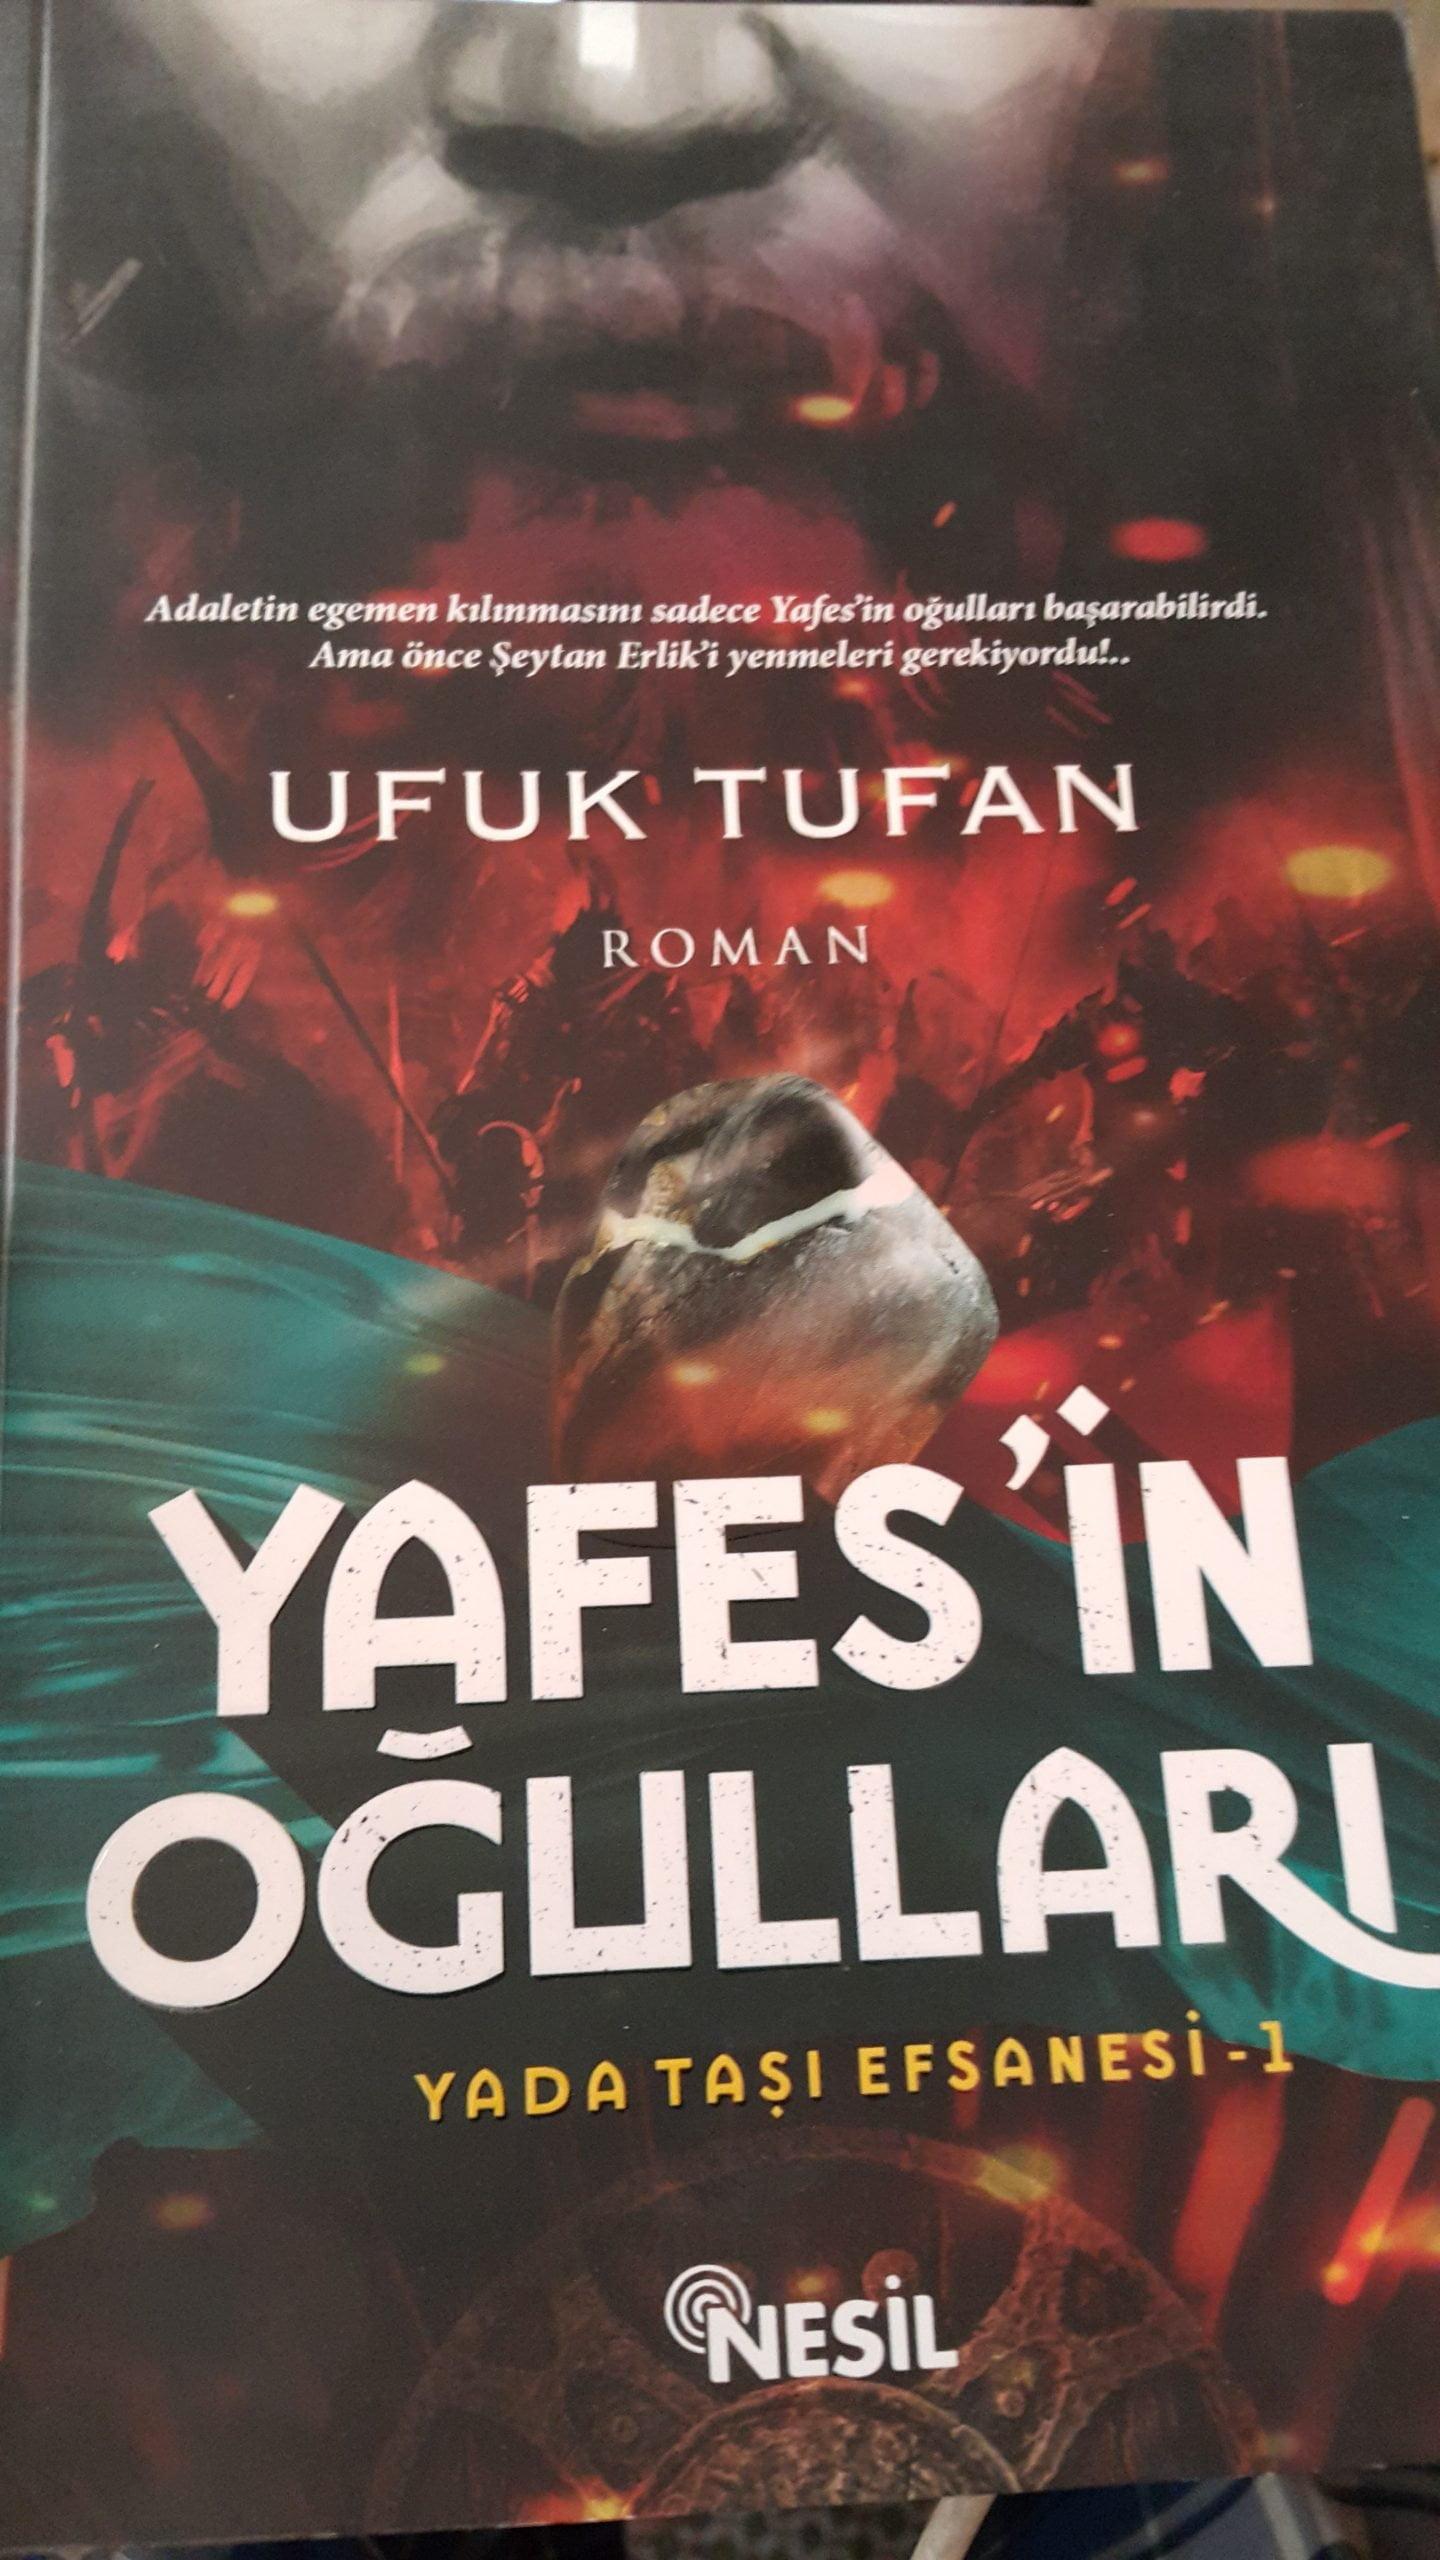 YAFES'İN OĞULLARI/YADA TAŞI EFSANESİ-1/UFUK TUFAN